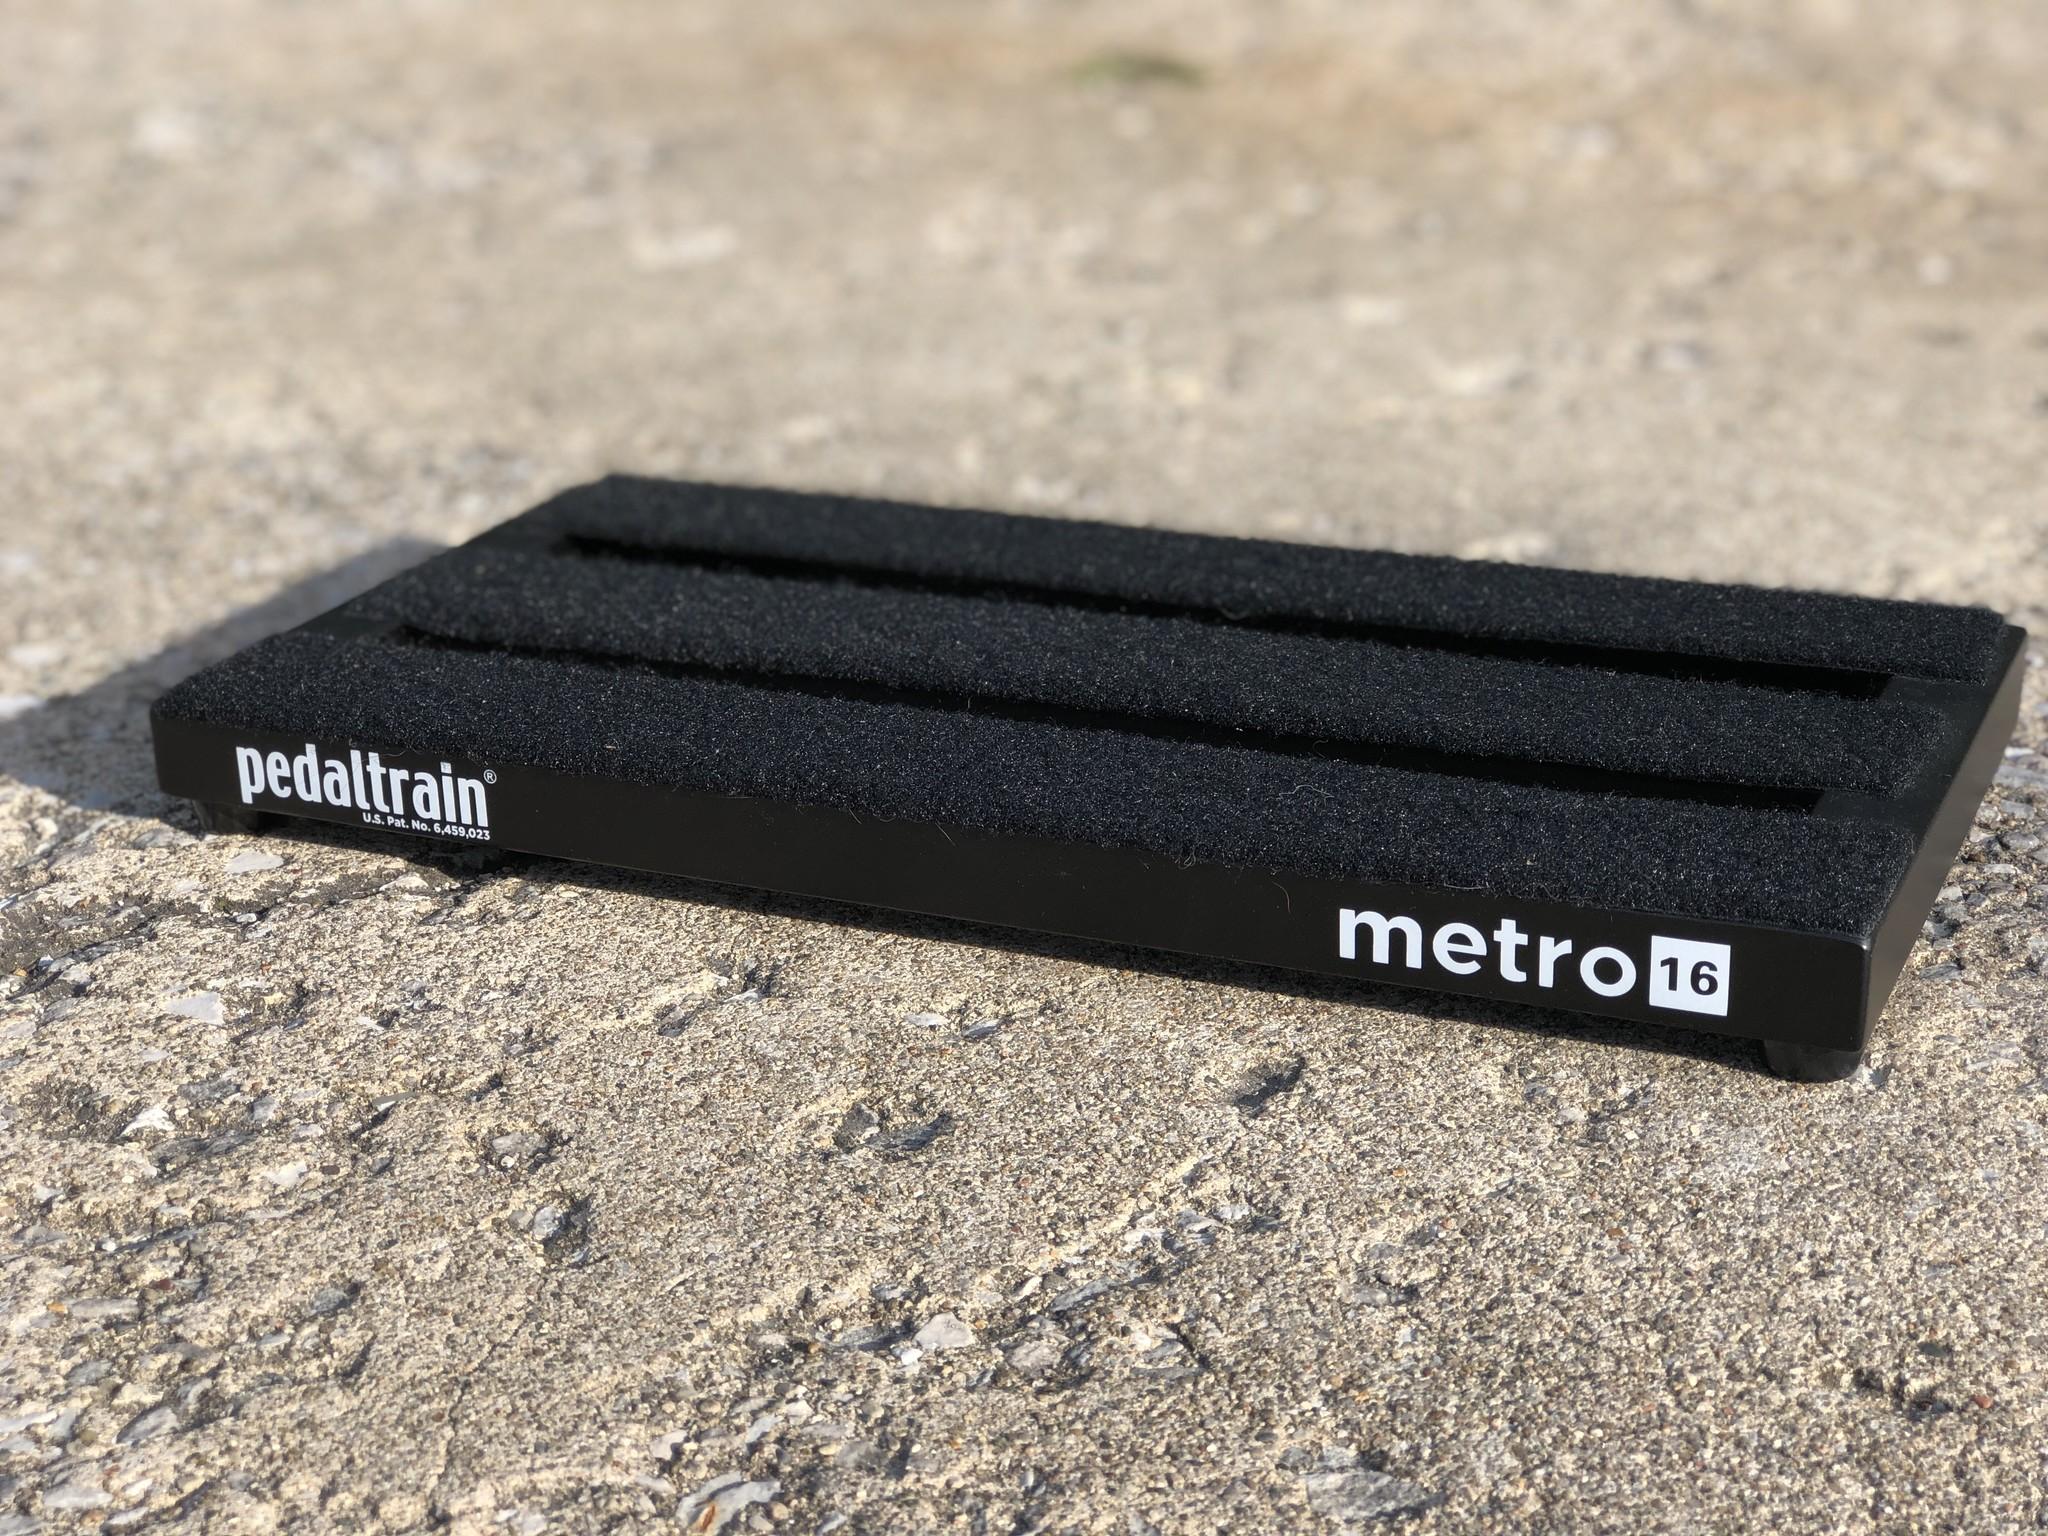 Pedaltrain Metro 16 w/softbag-4